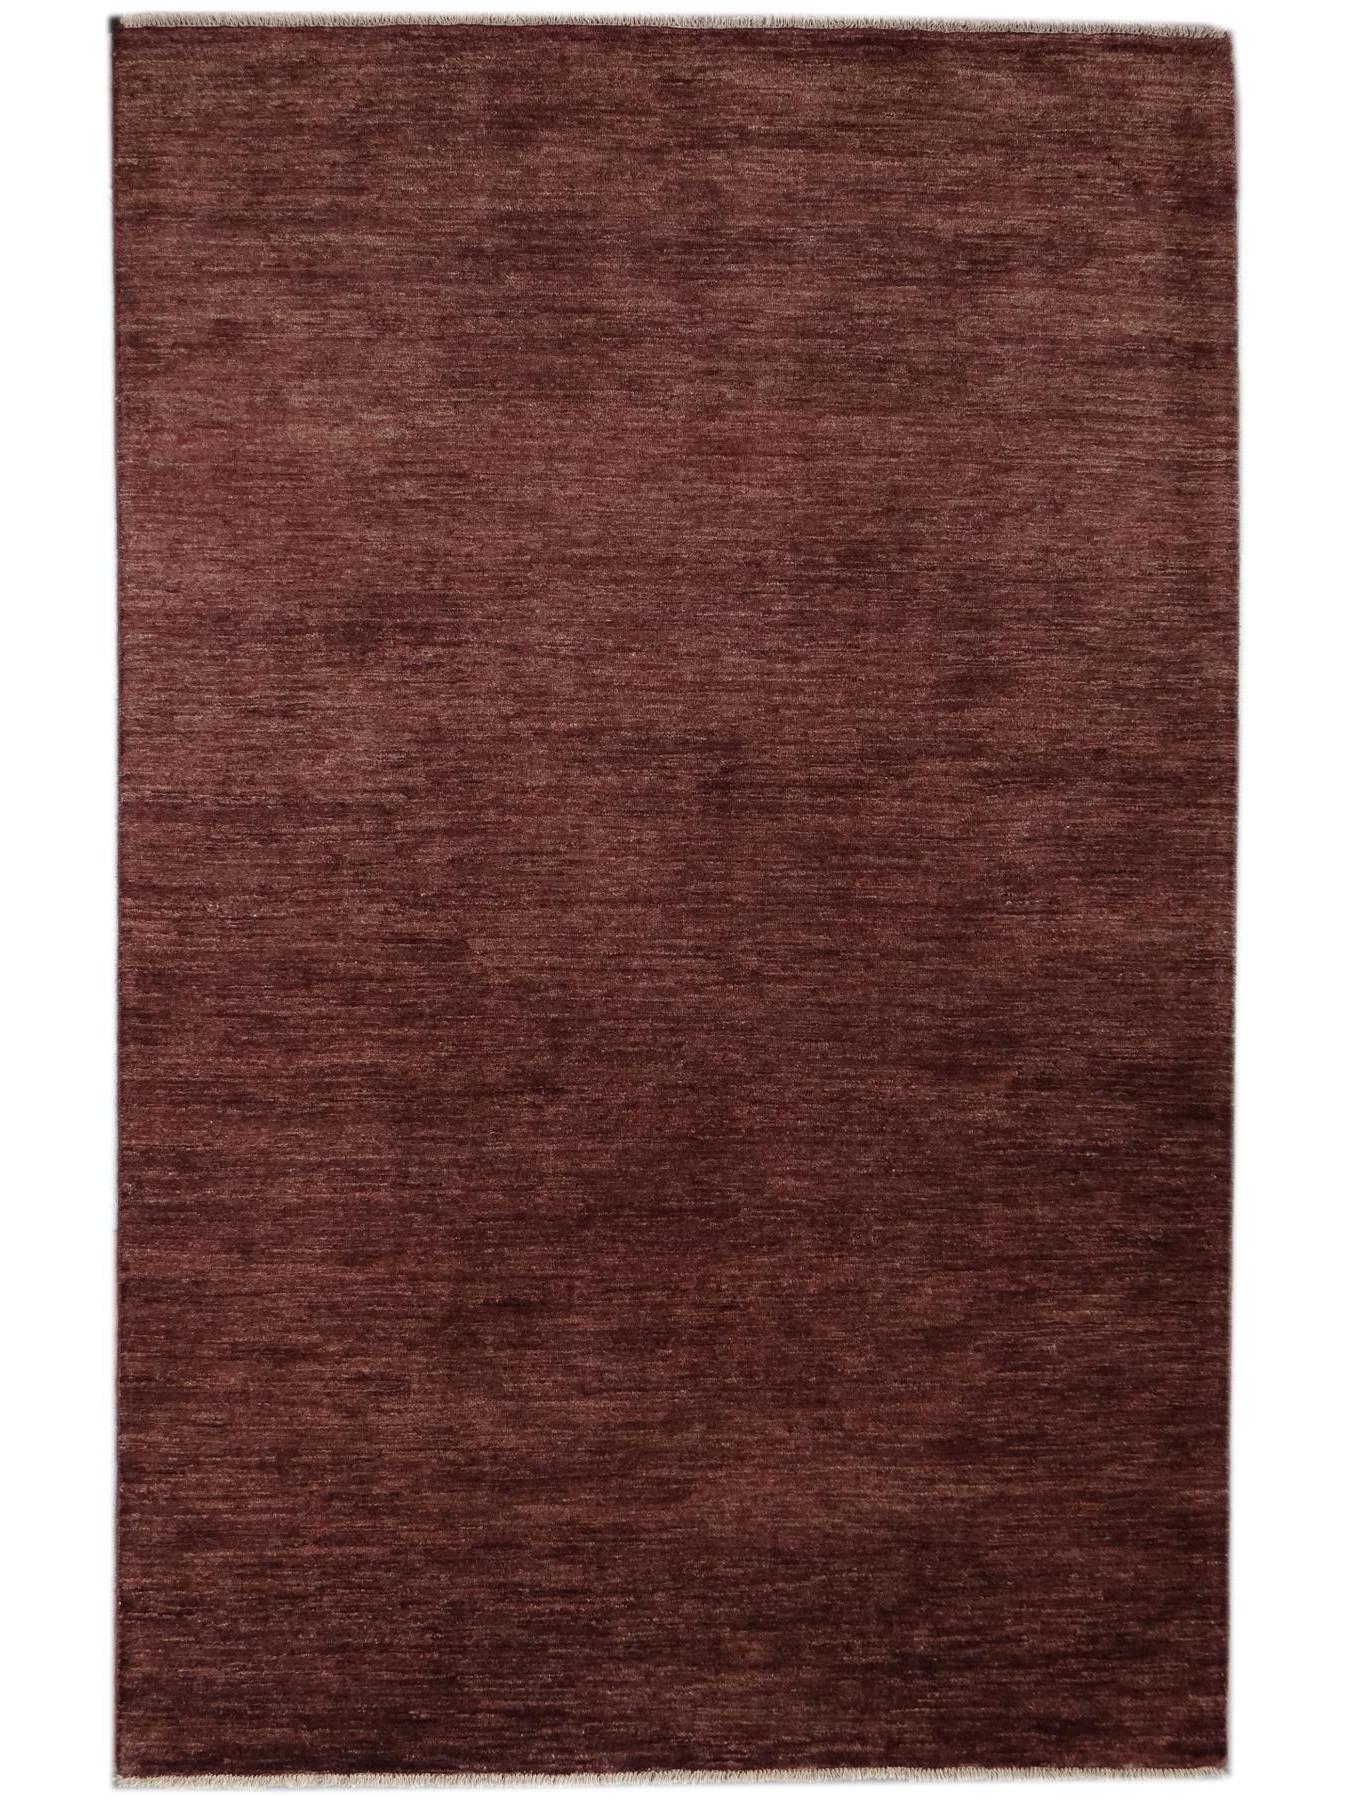 Ethnic carpets - TIMUR - DESERT